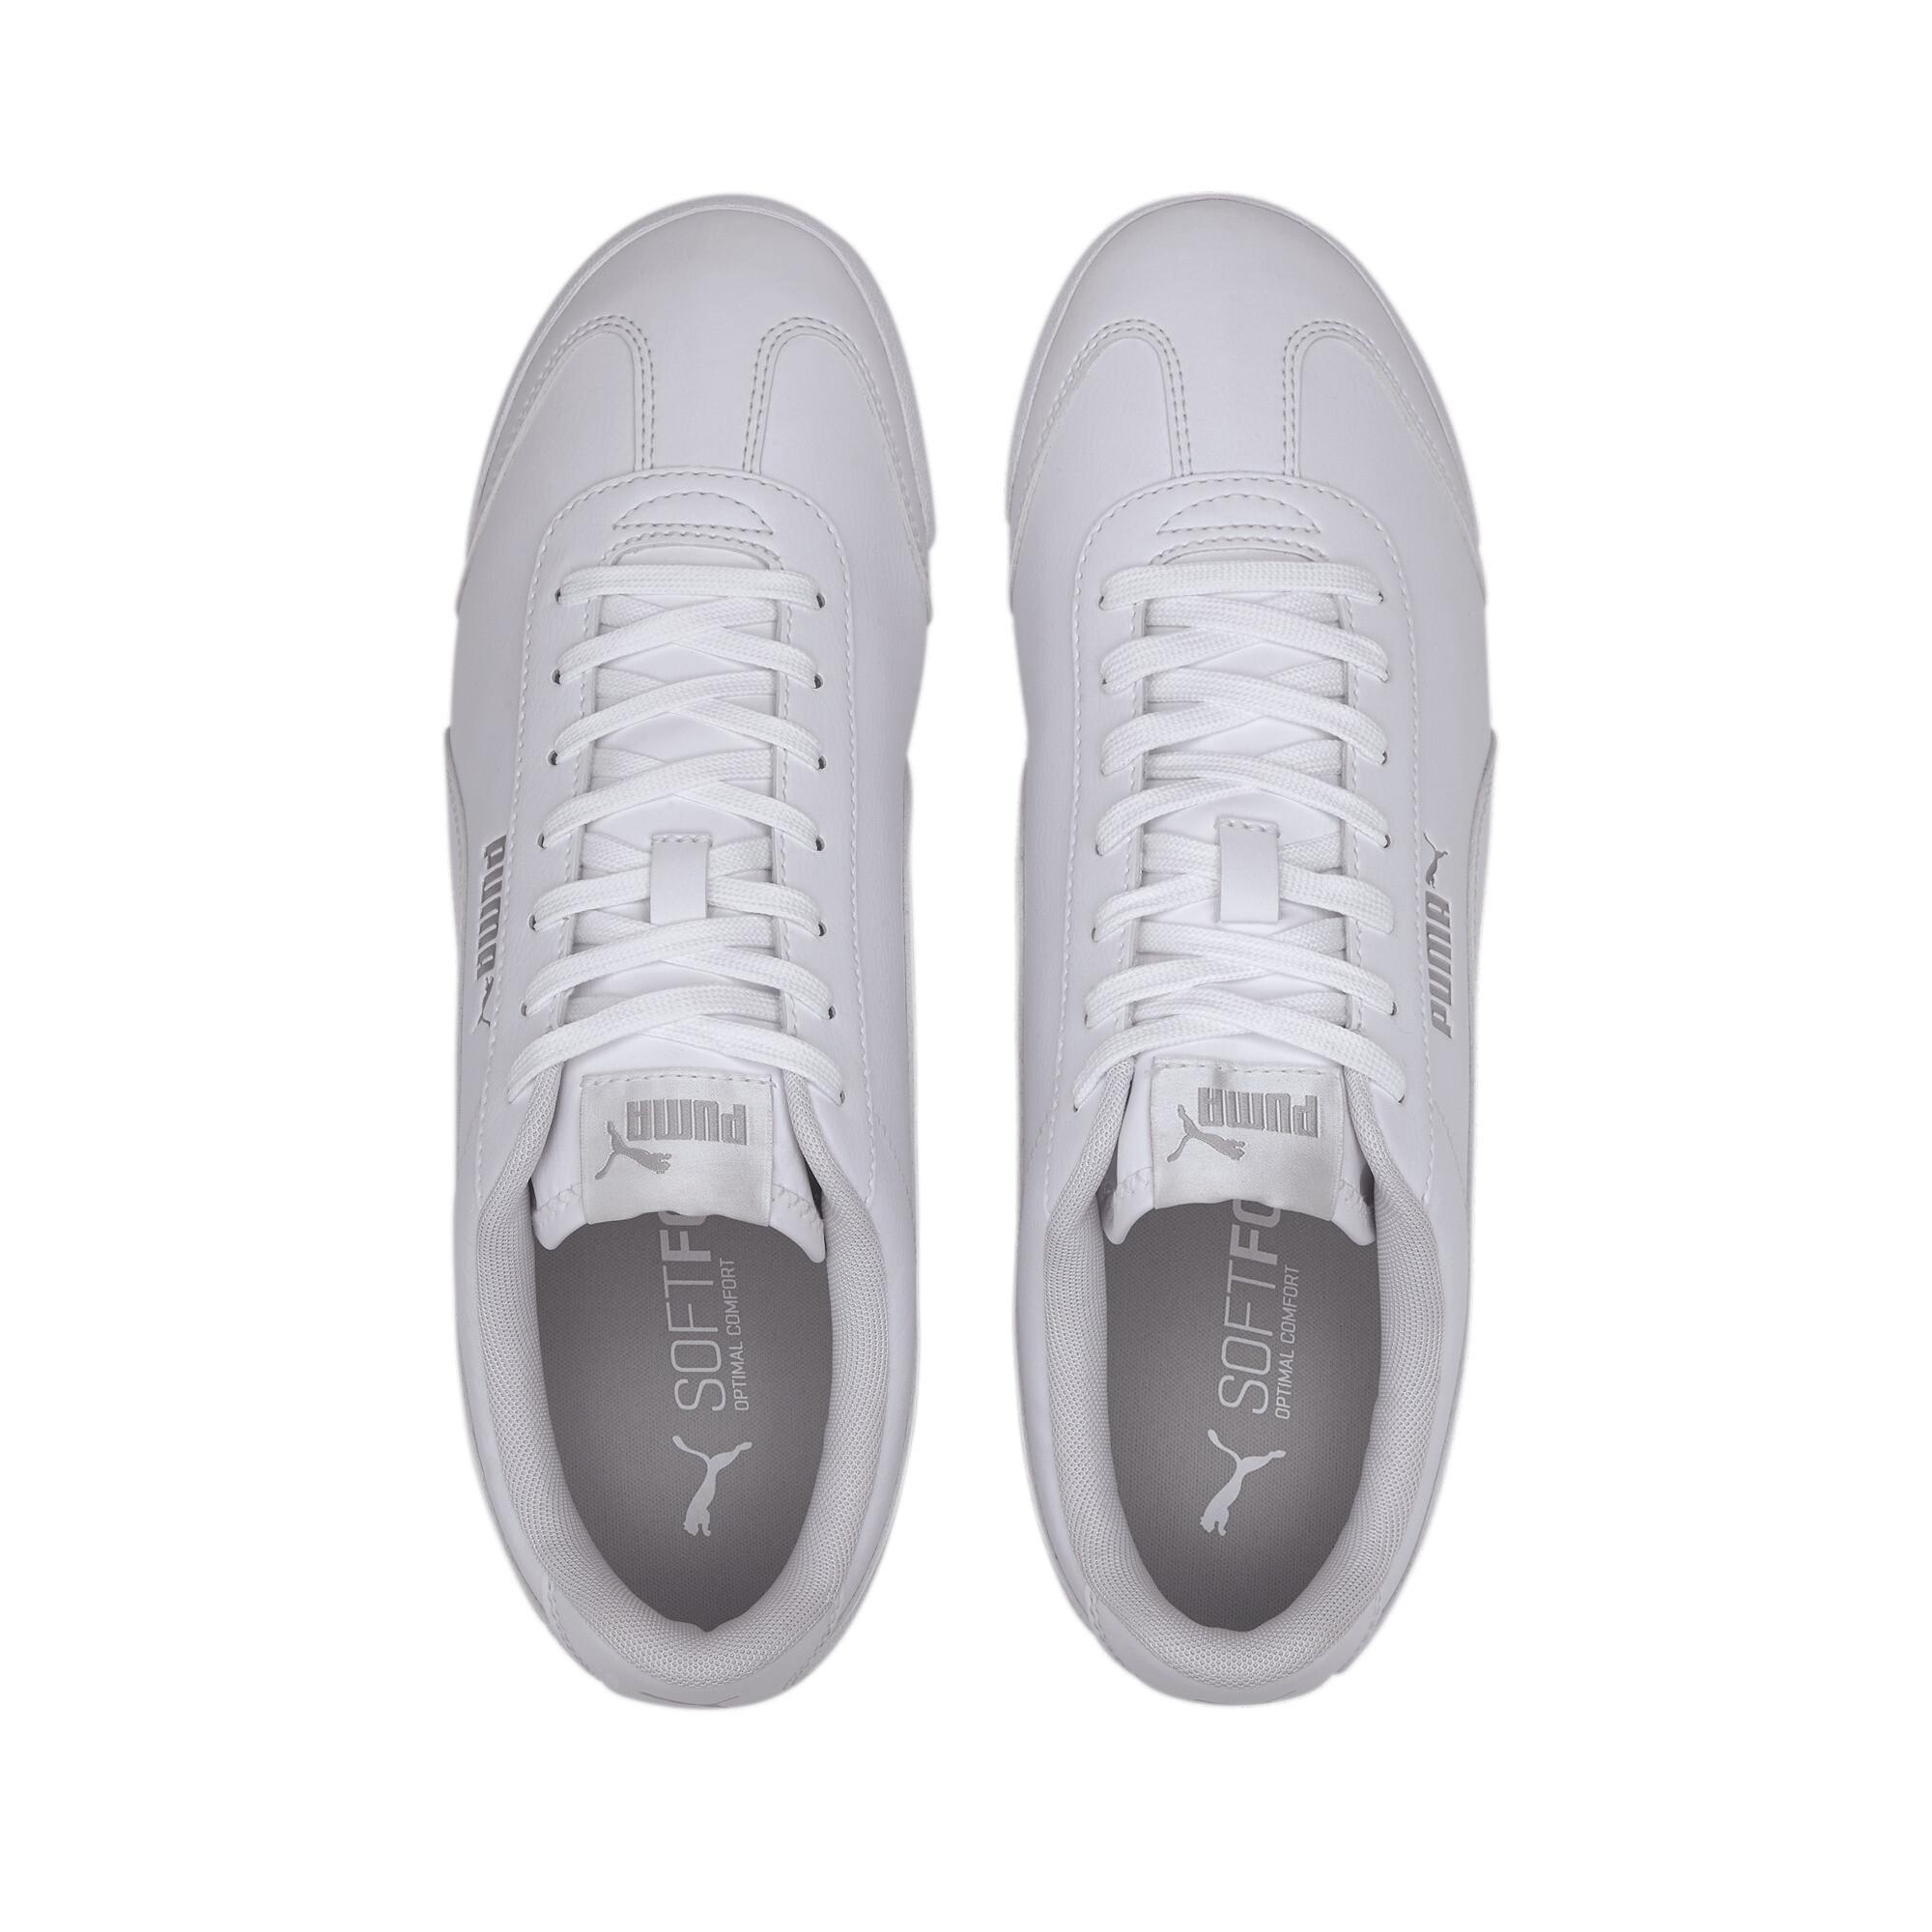 PUMA-Men-039-s-Turino-SL-Sneakers thumbnail 8